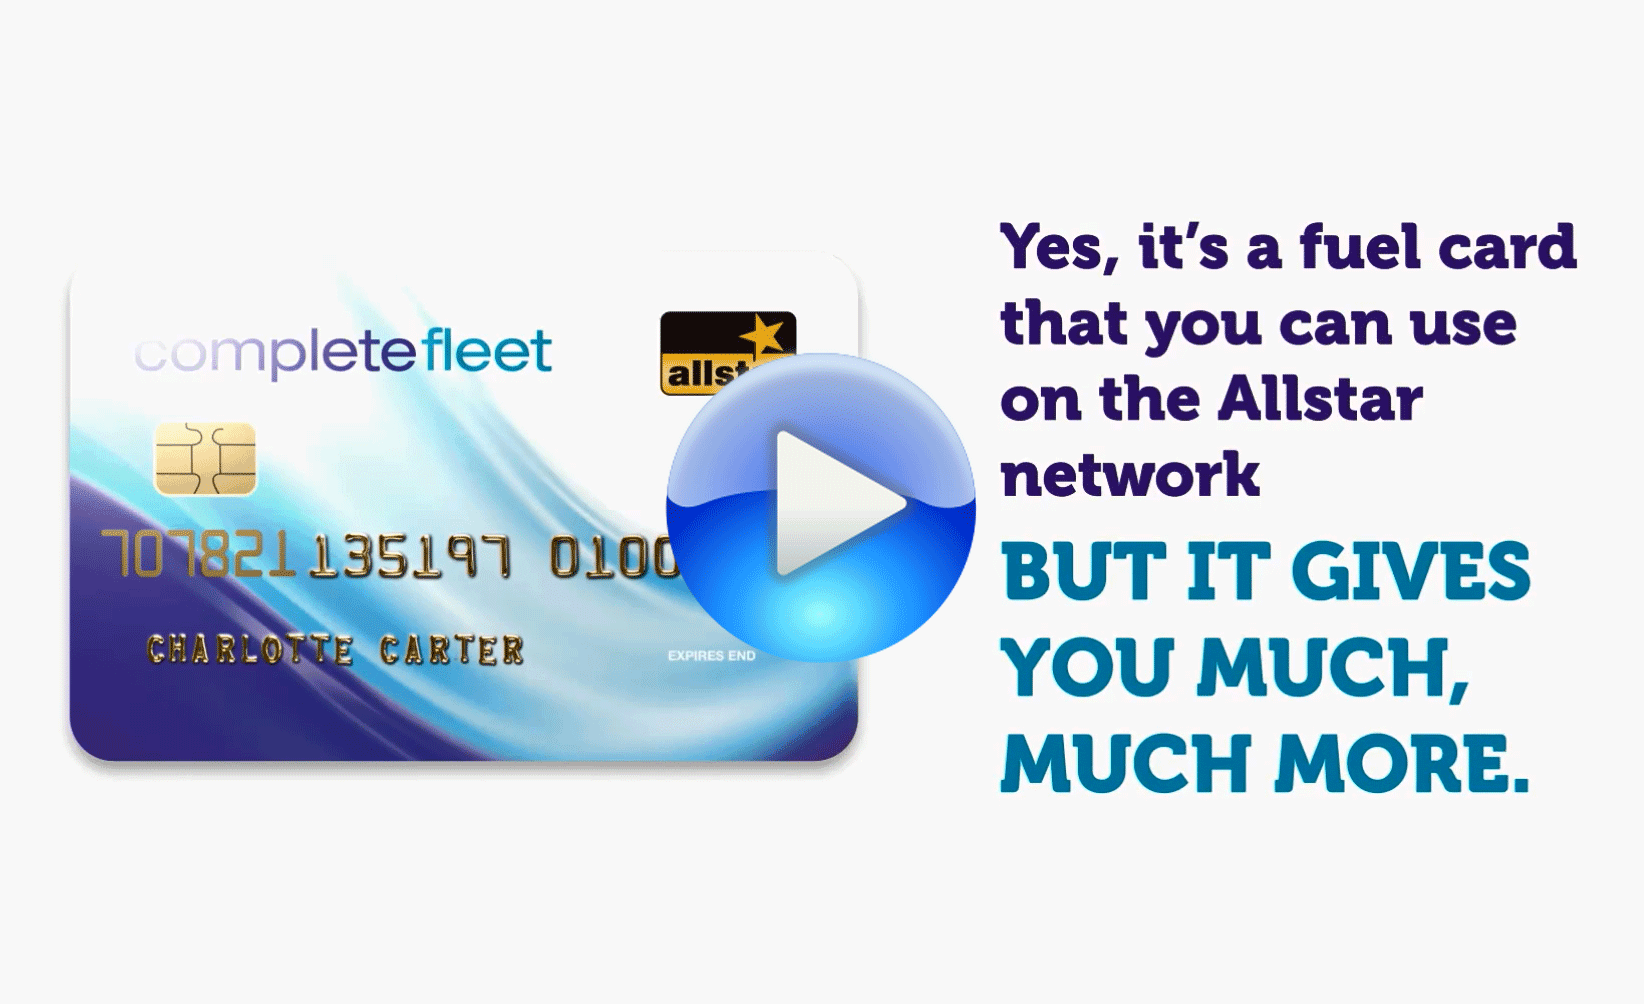 Completefleet with the Allstar network